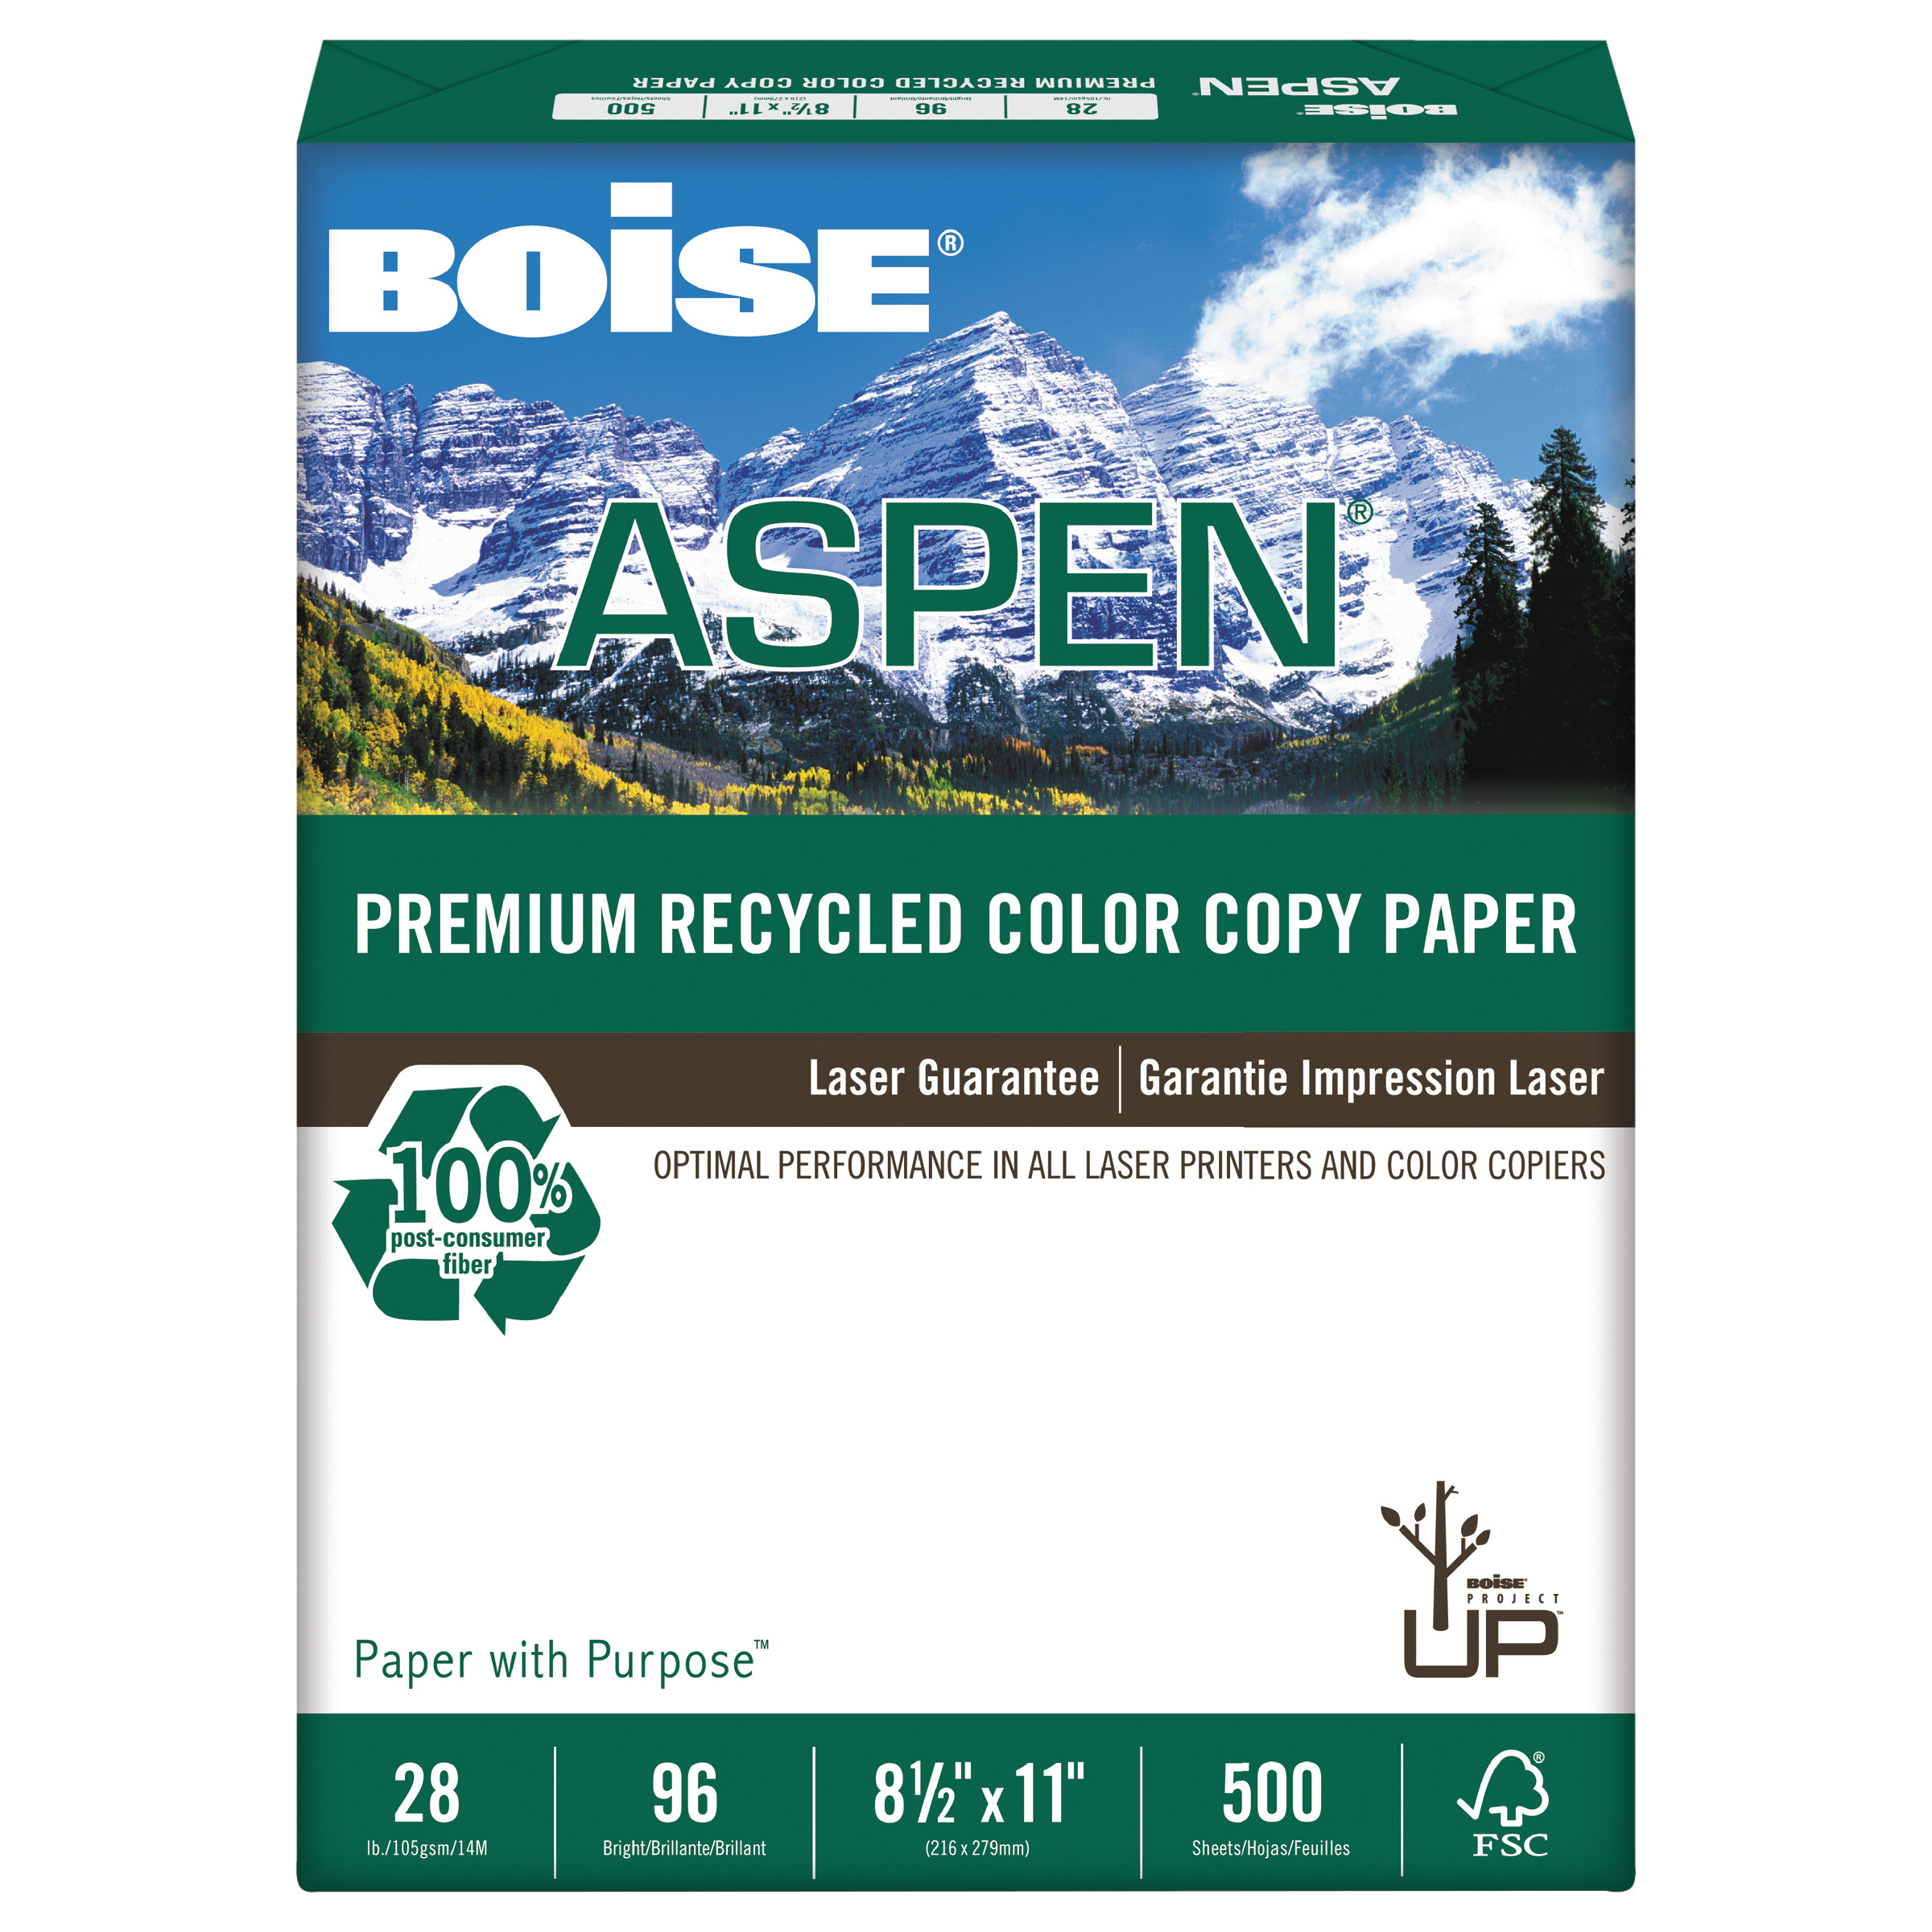 Boise ASPEN Premium Recycled Paper, 96 Bright, 28lb, Letter, White, 500 Sheets